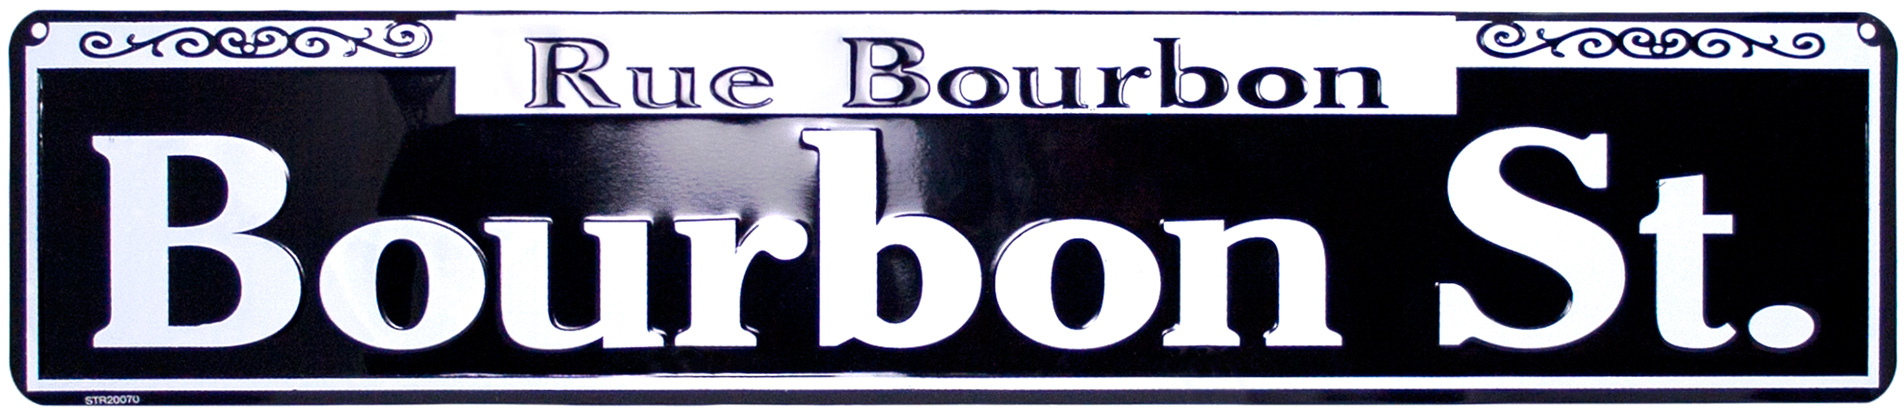 13 Bourbon Street Sign Vector Images.